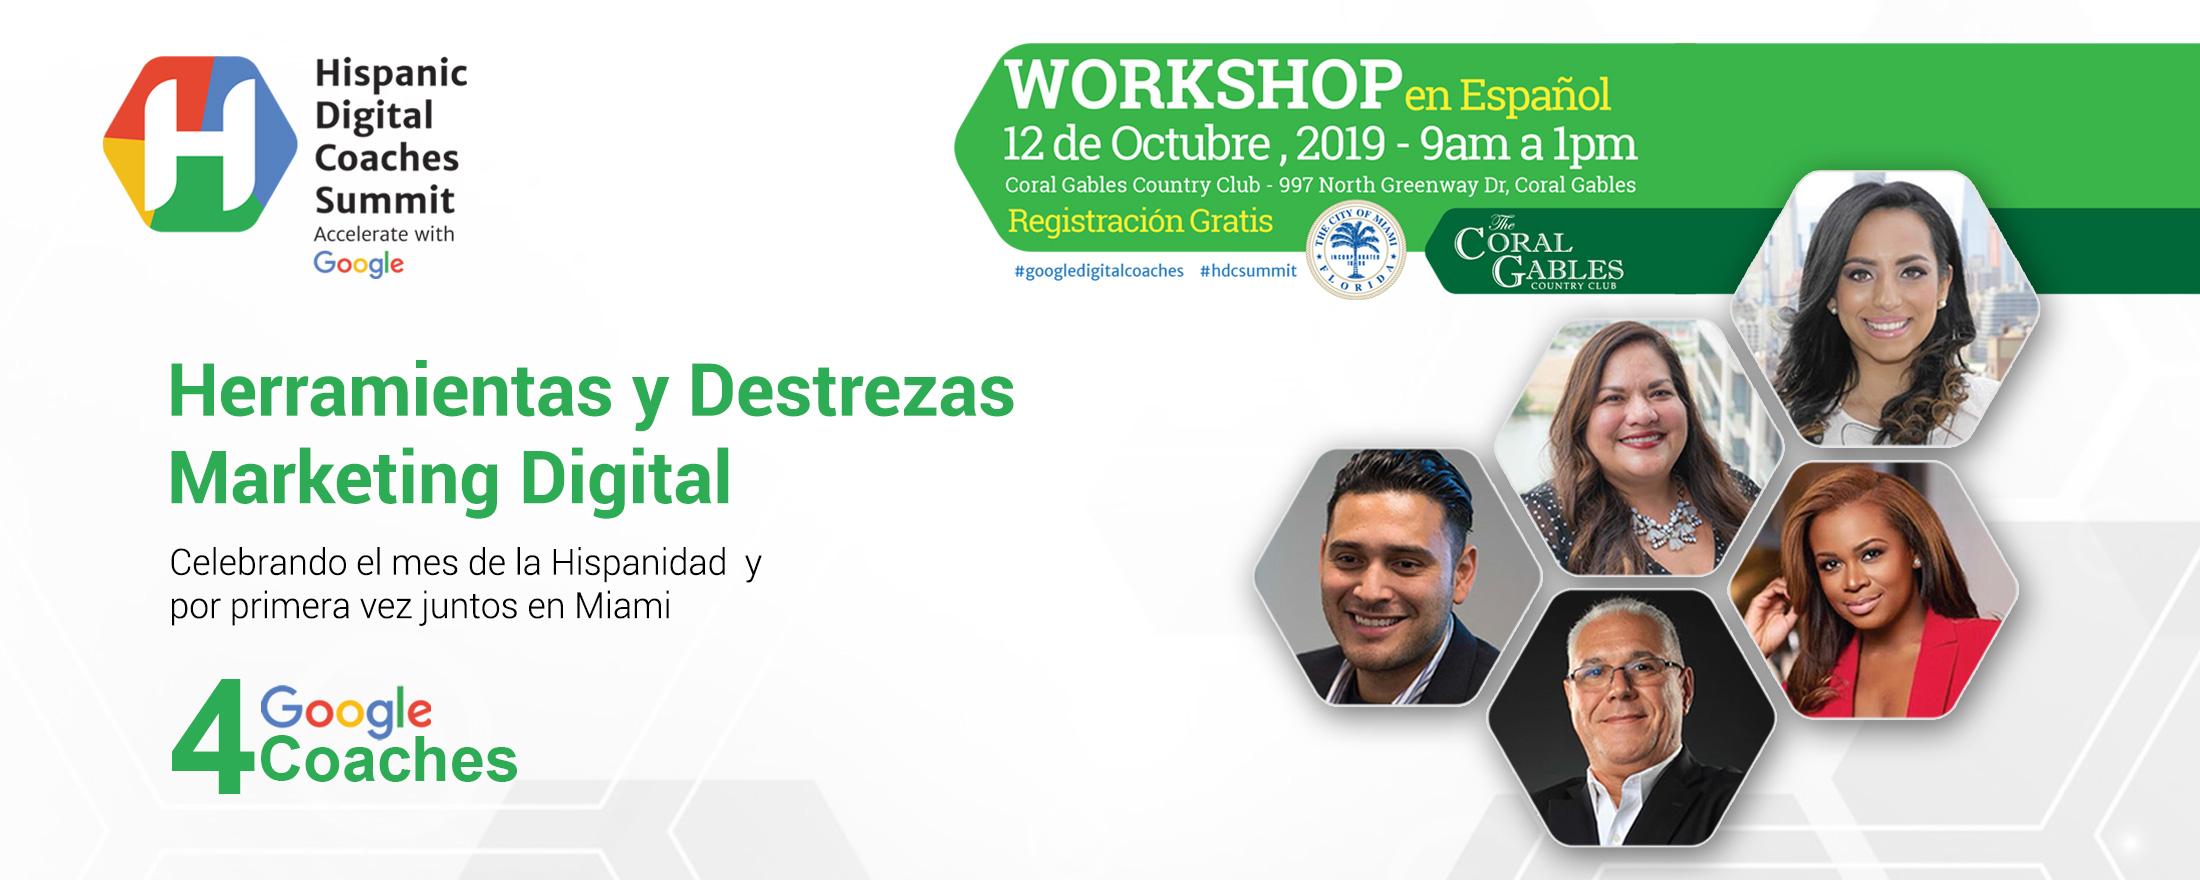 Hispanic Digital Coaches Summit